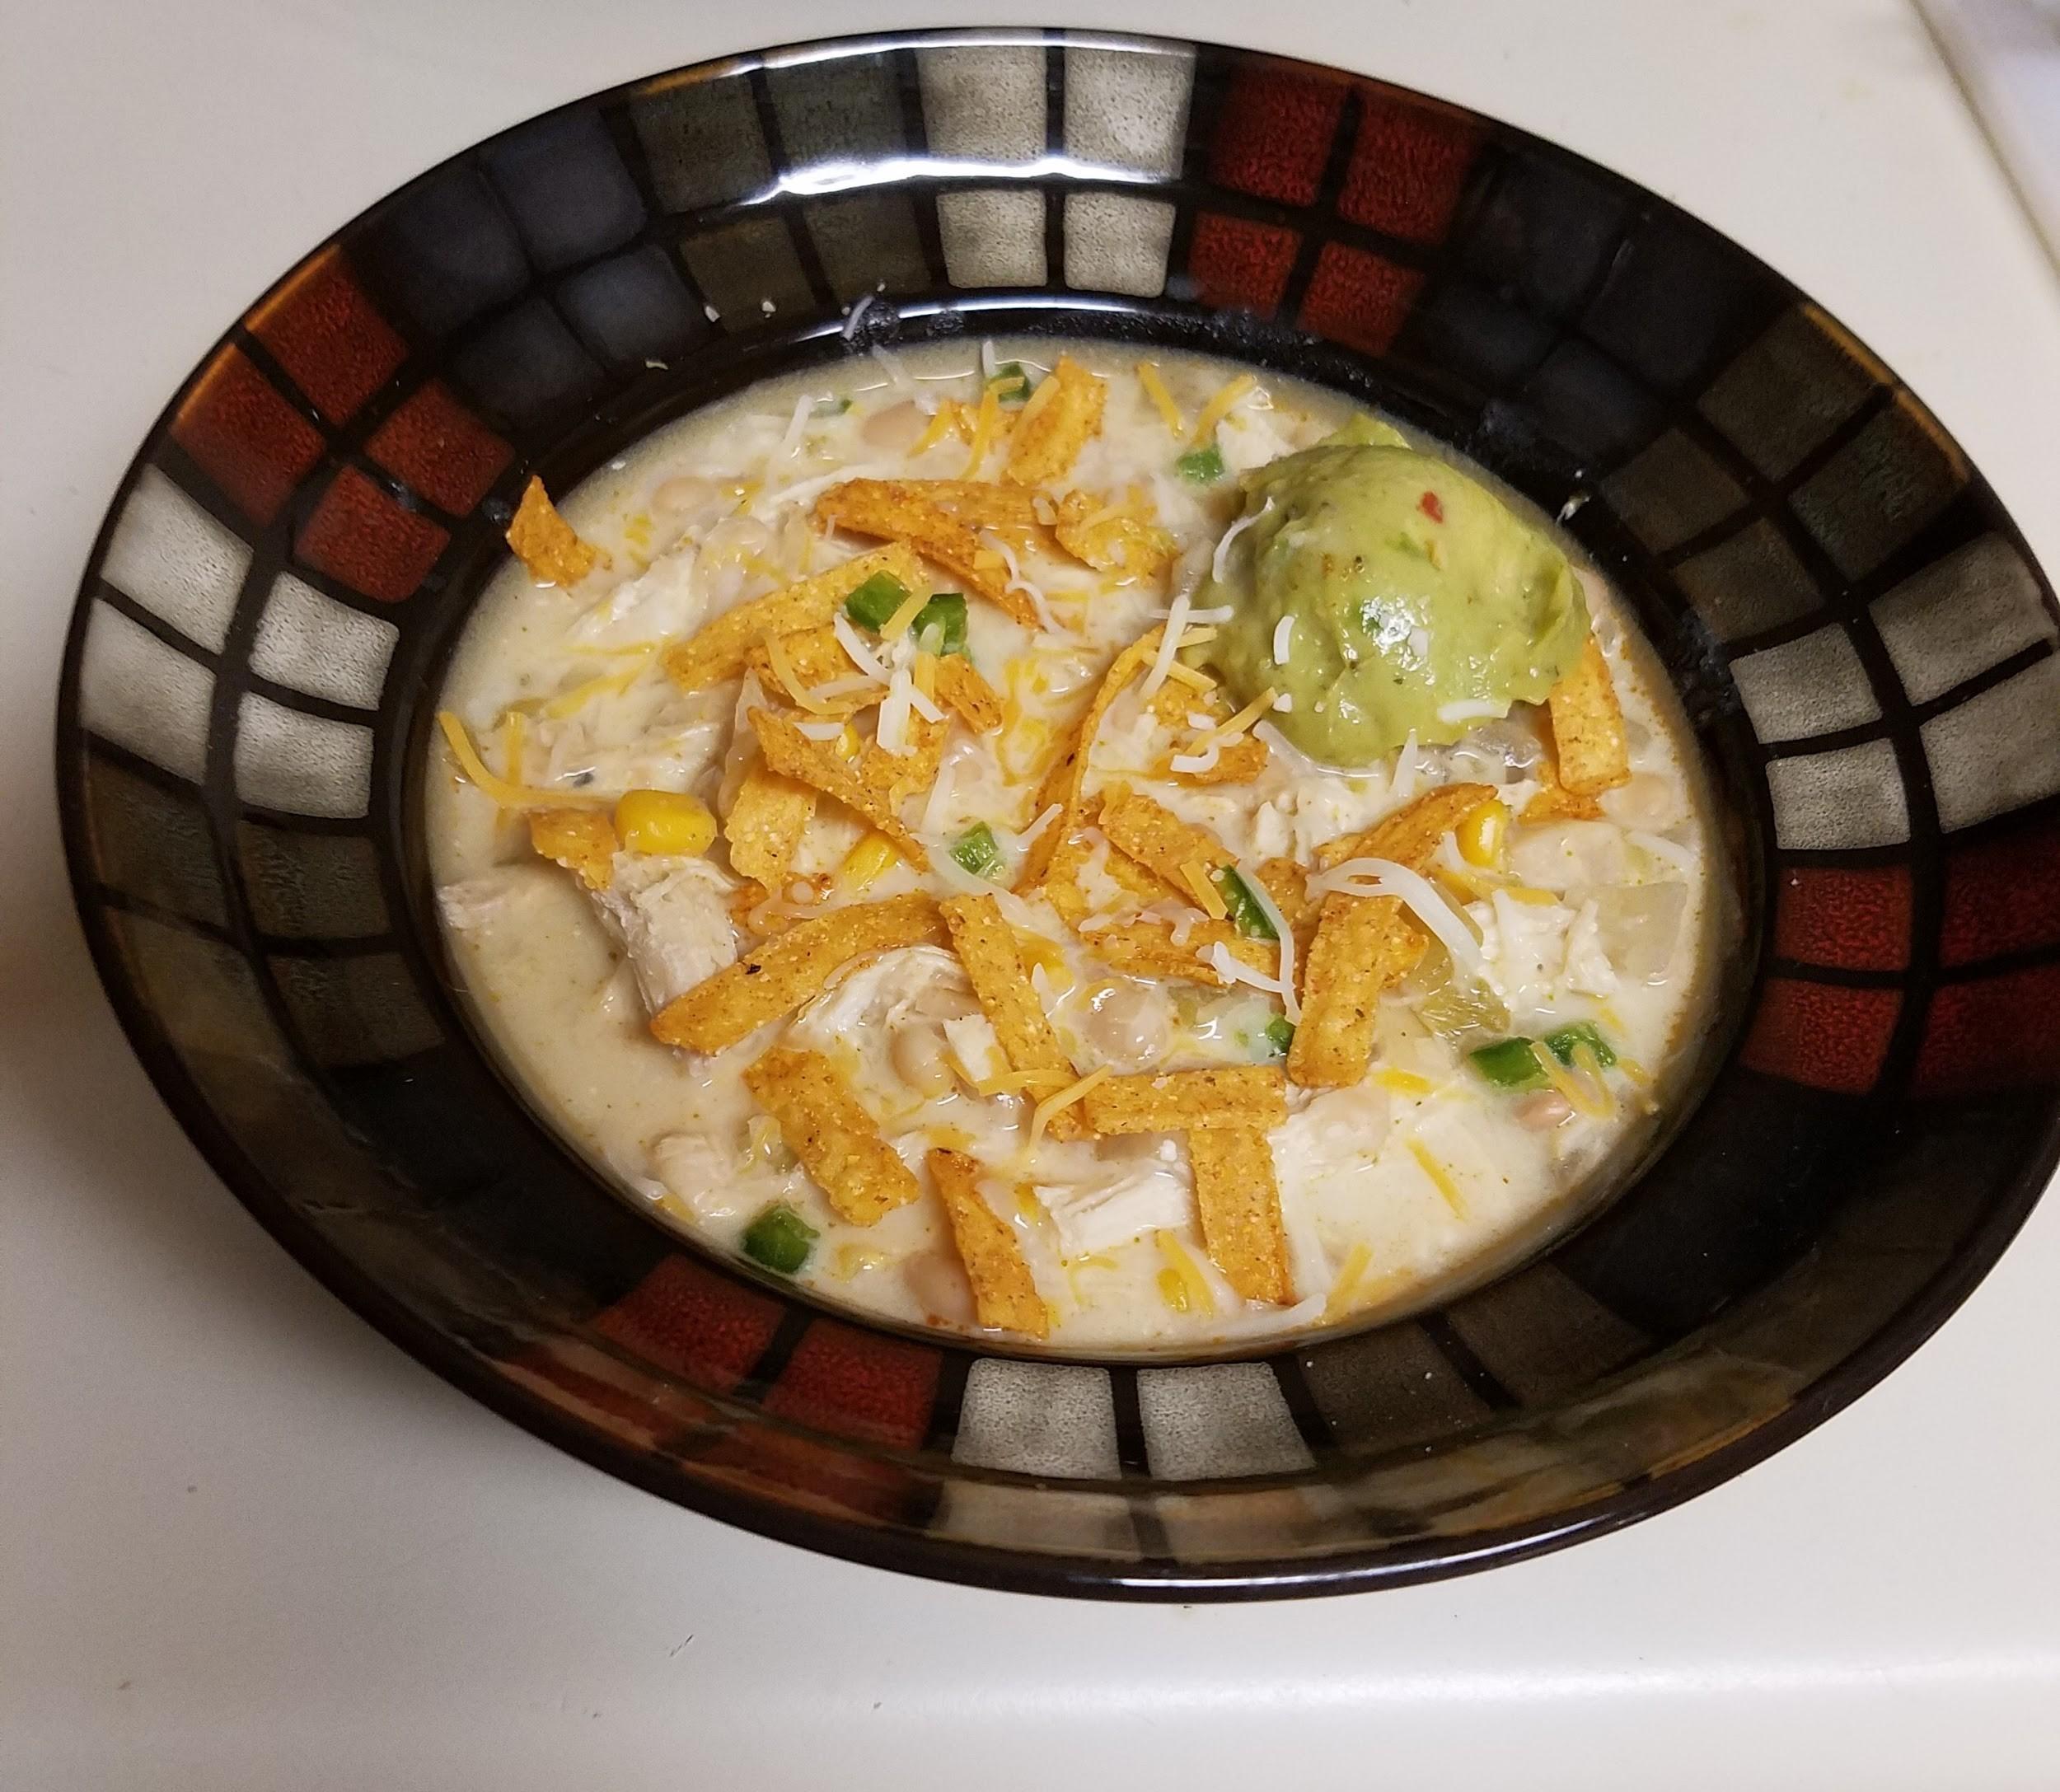 Incredible White Chicken Chili masterpiece served